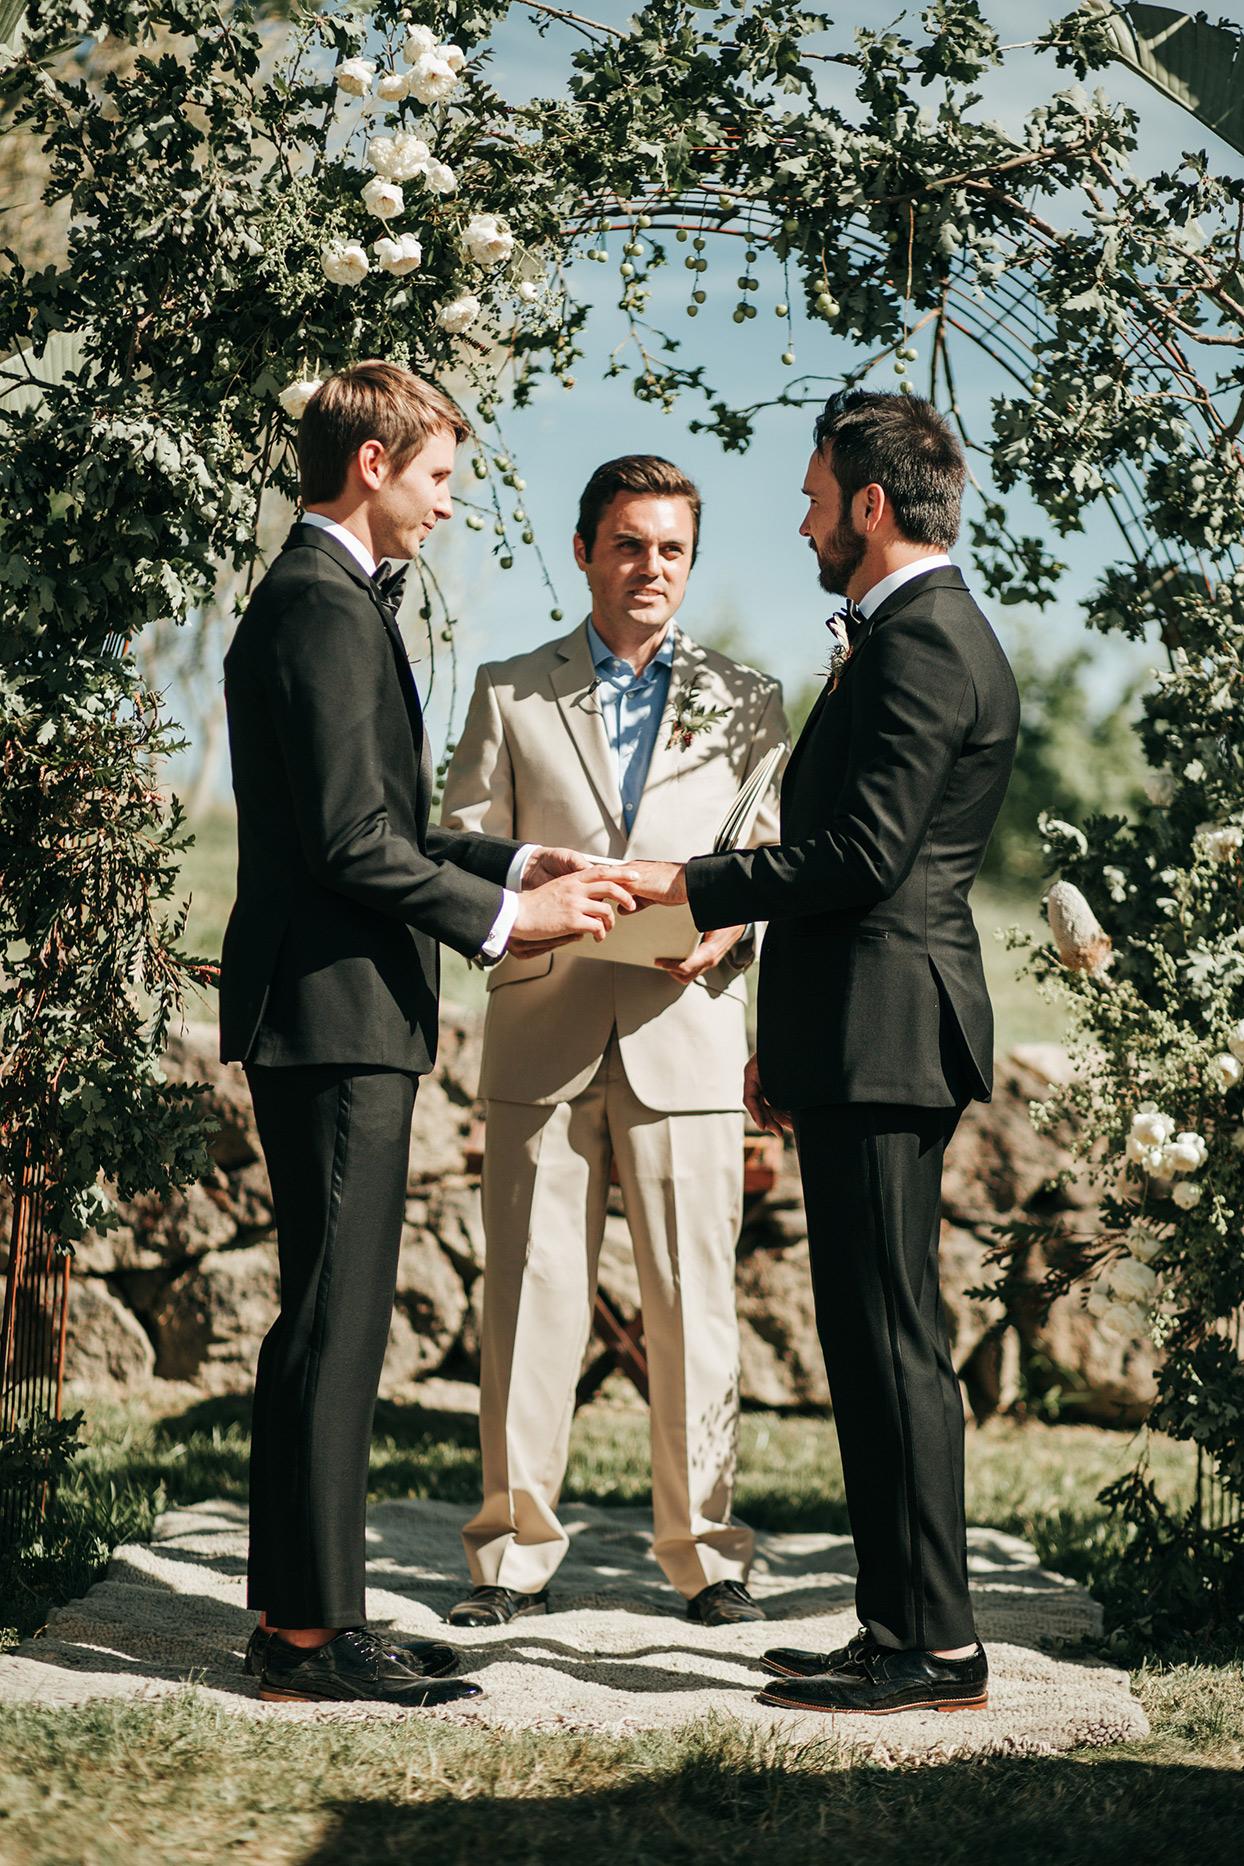 austin alex wedding ceremony rings